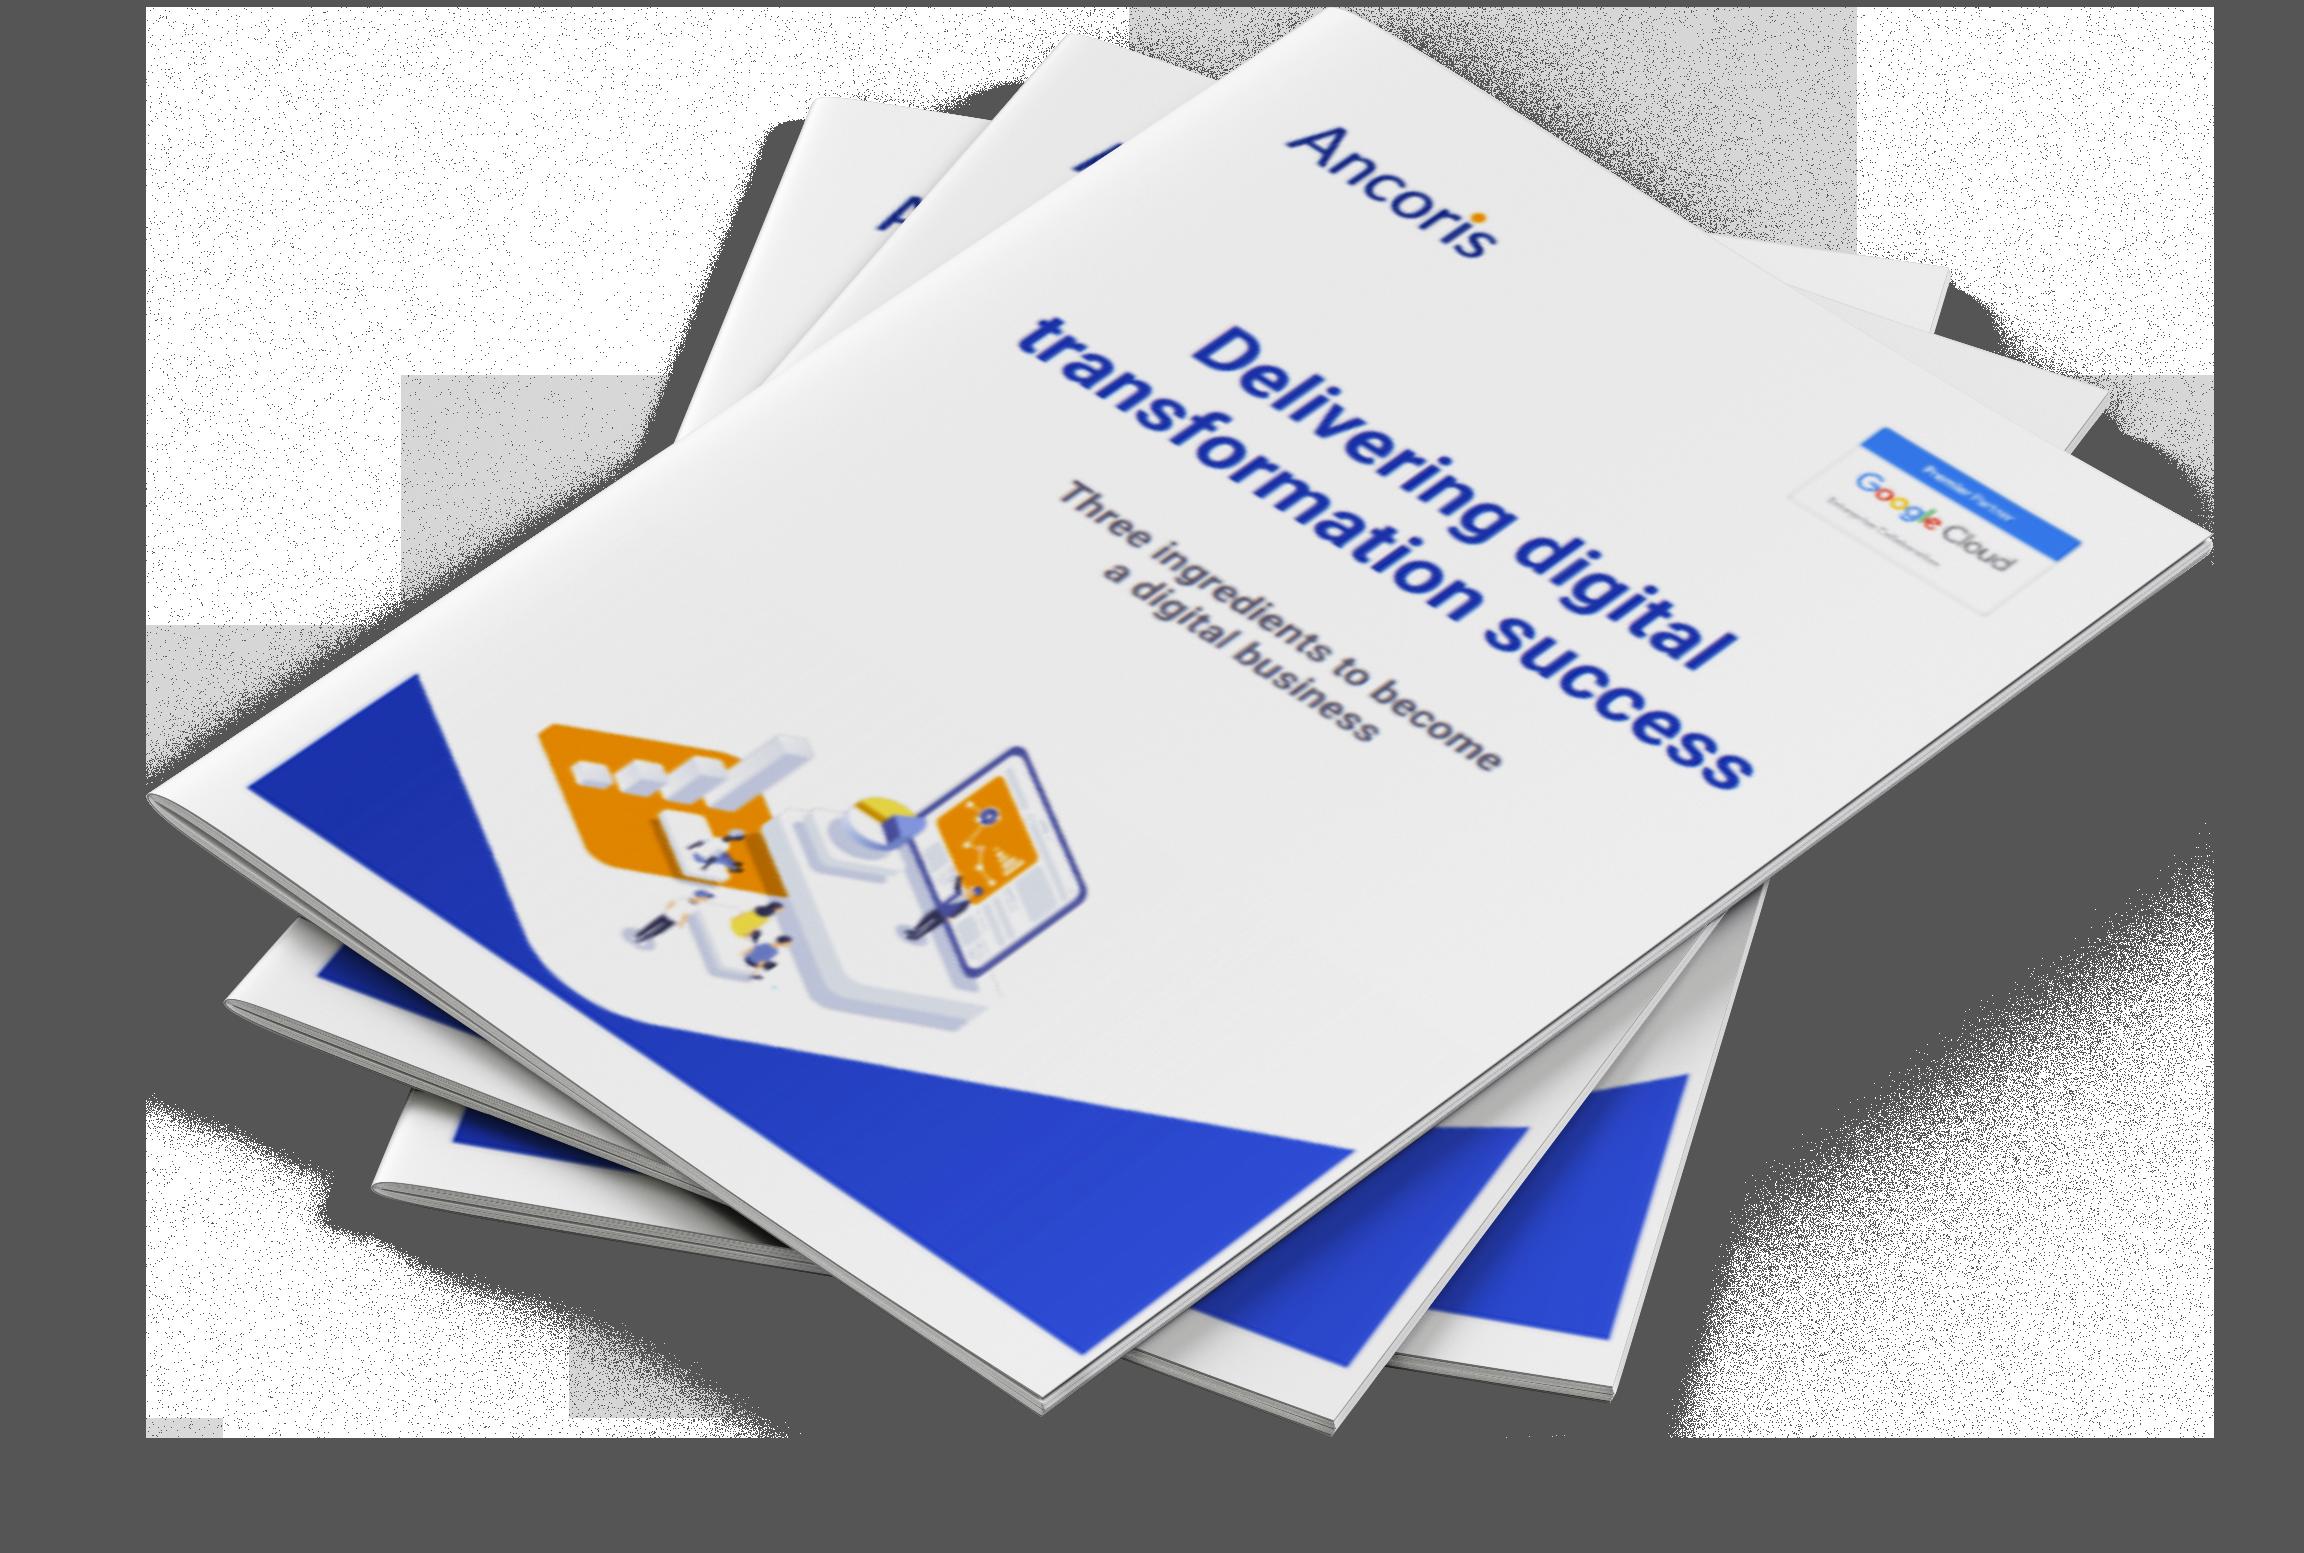 digital-transformation-success2-1